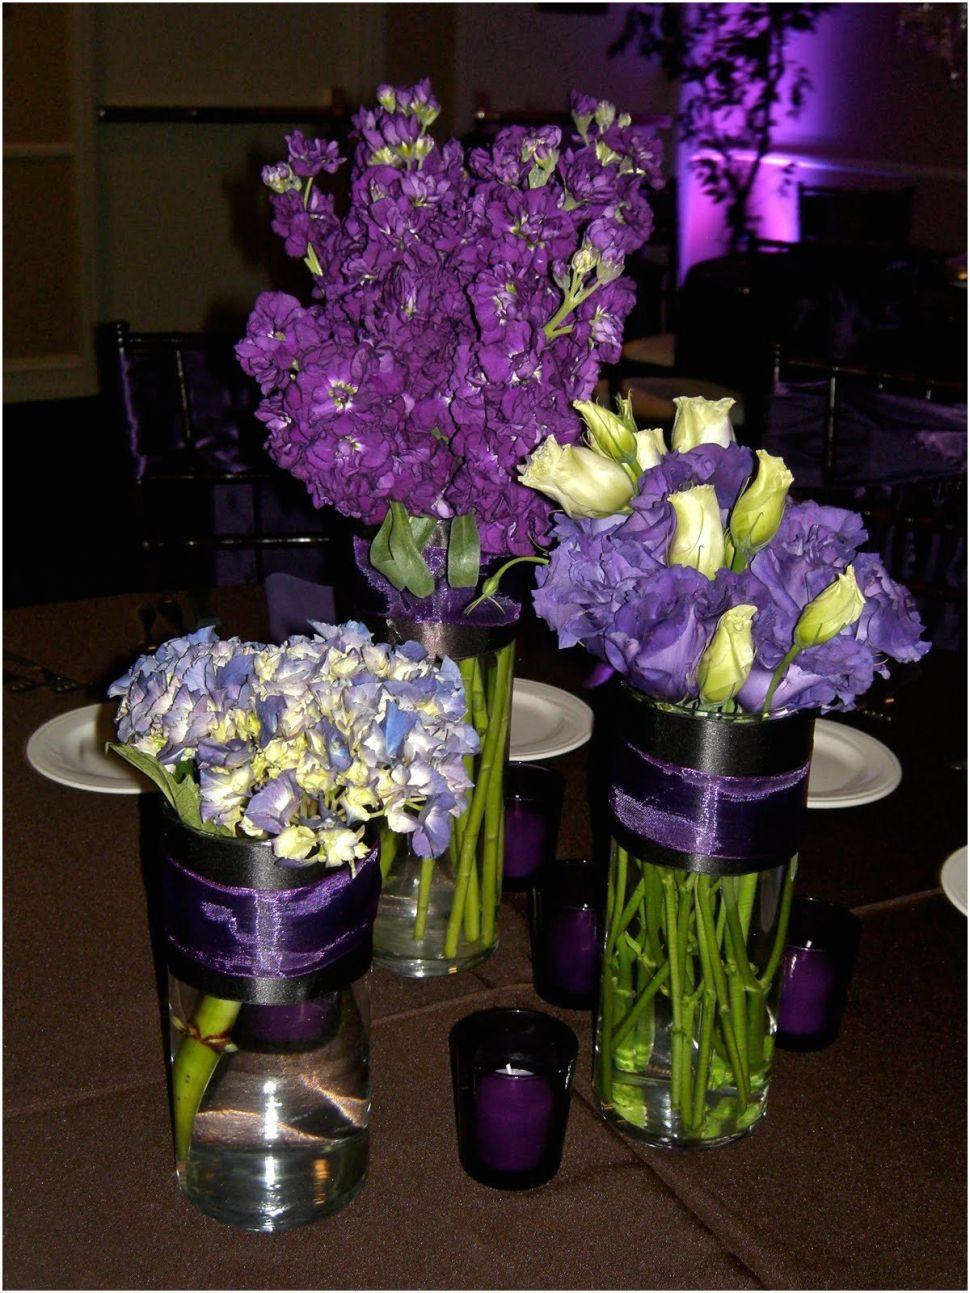 silver urn vase of silver flower pots pics silk orchids dsc 1329h vases purple previ 0d with regard to silver flower pots pics silk orchids dsc 1329h vases purple previ 0d floor fenton scheme of